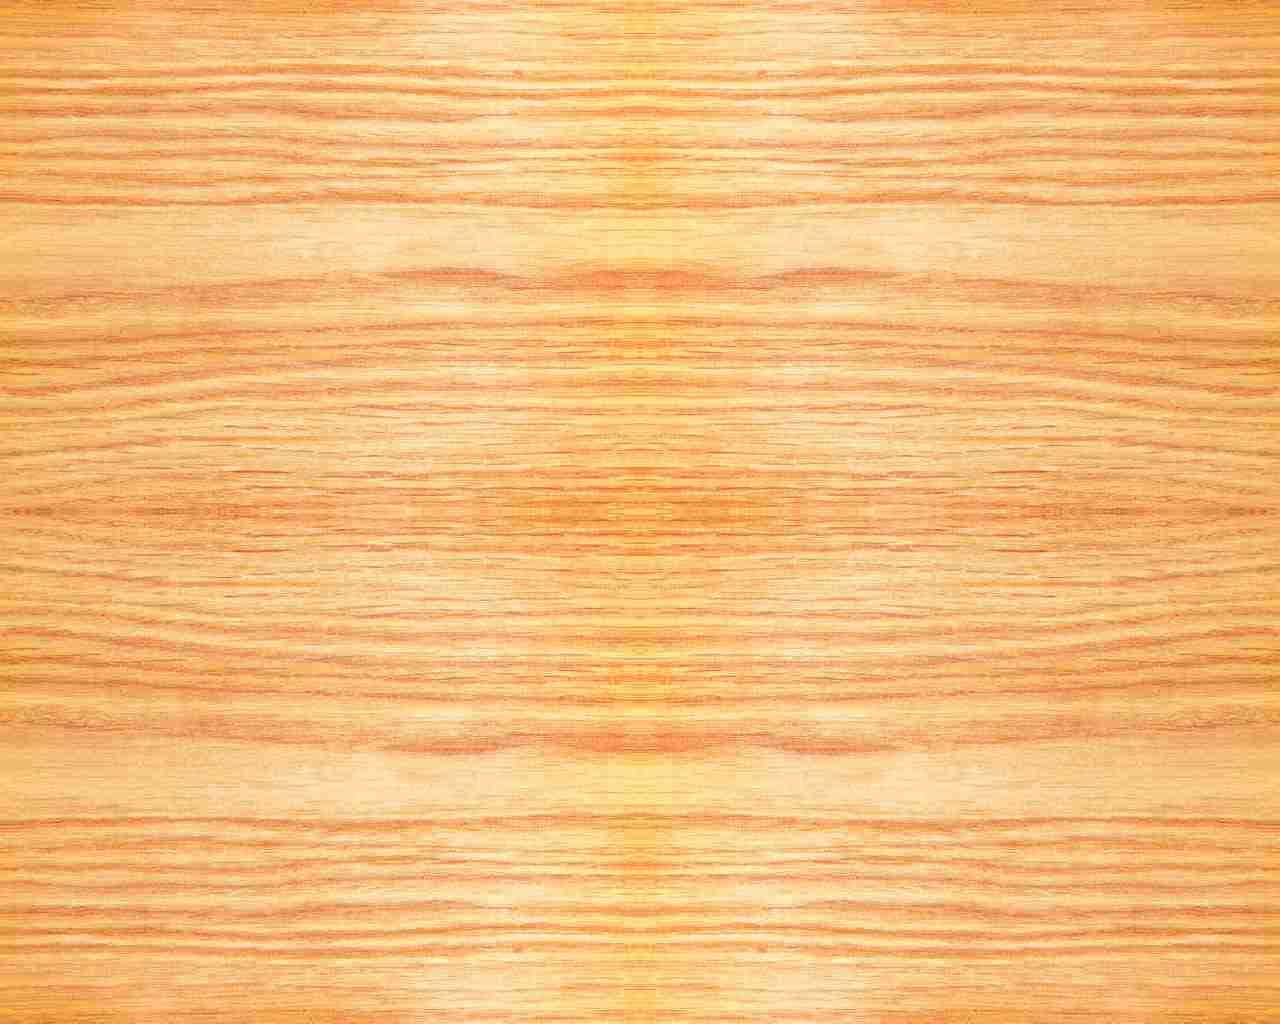 light wood floor background the image